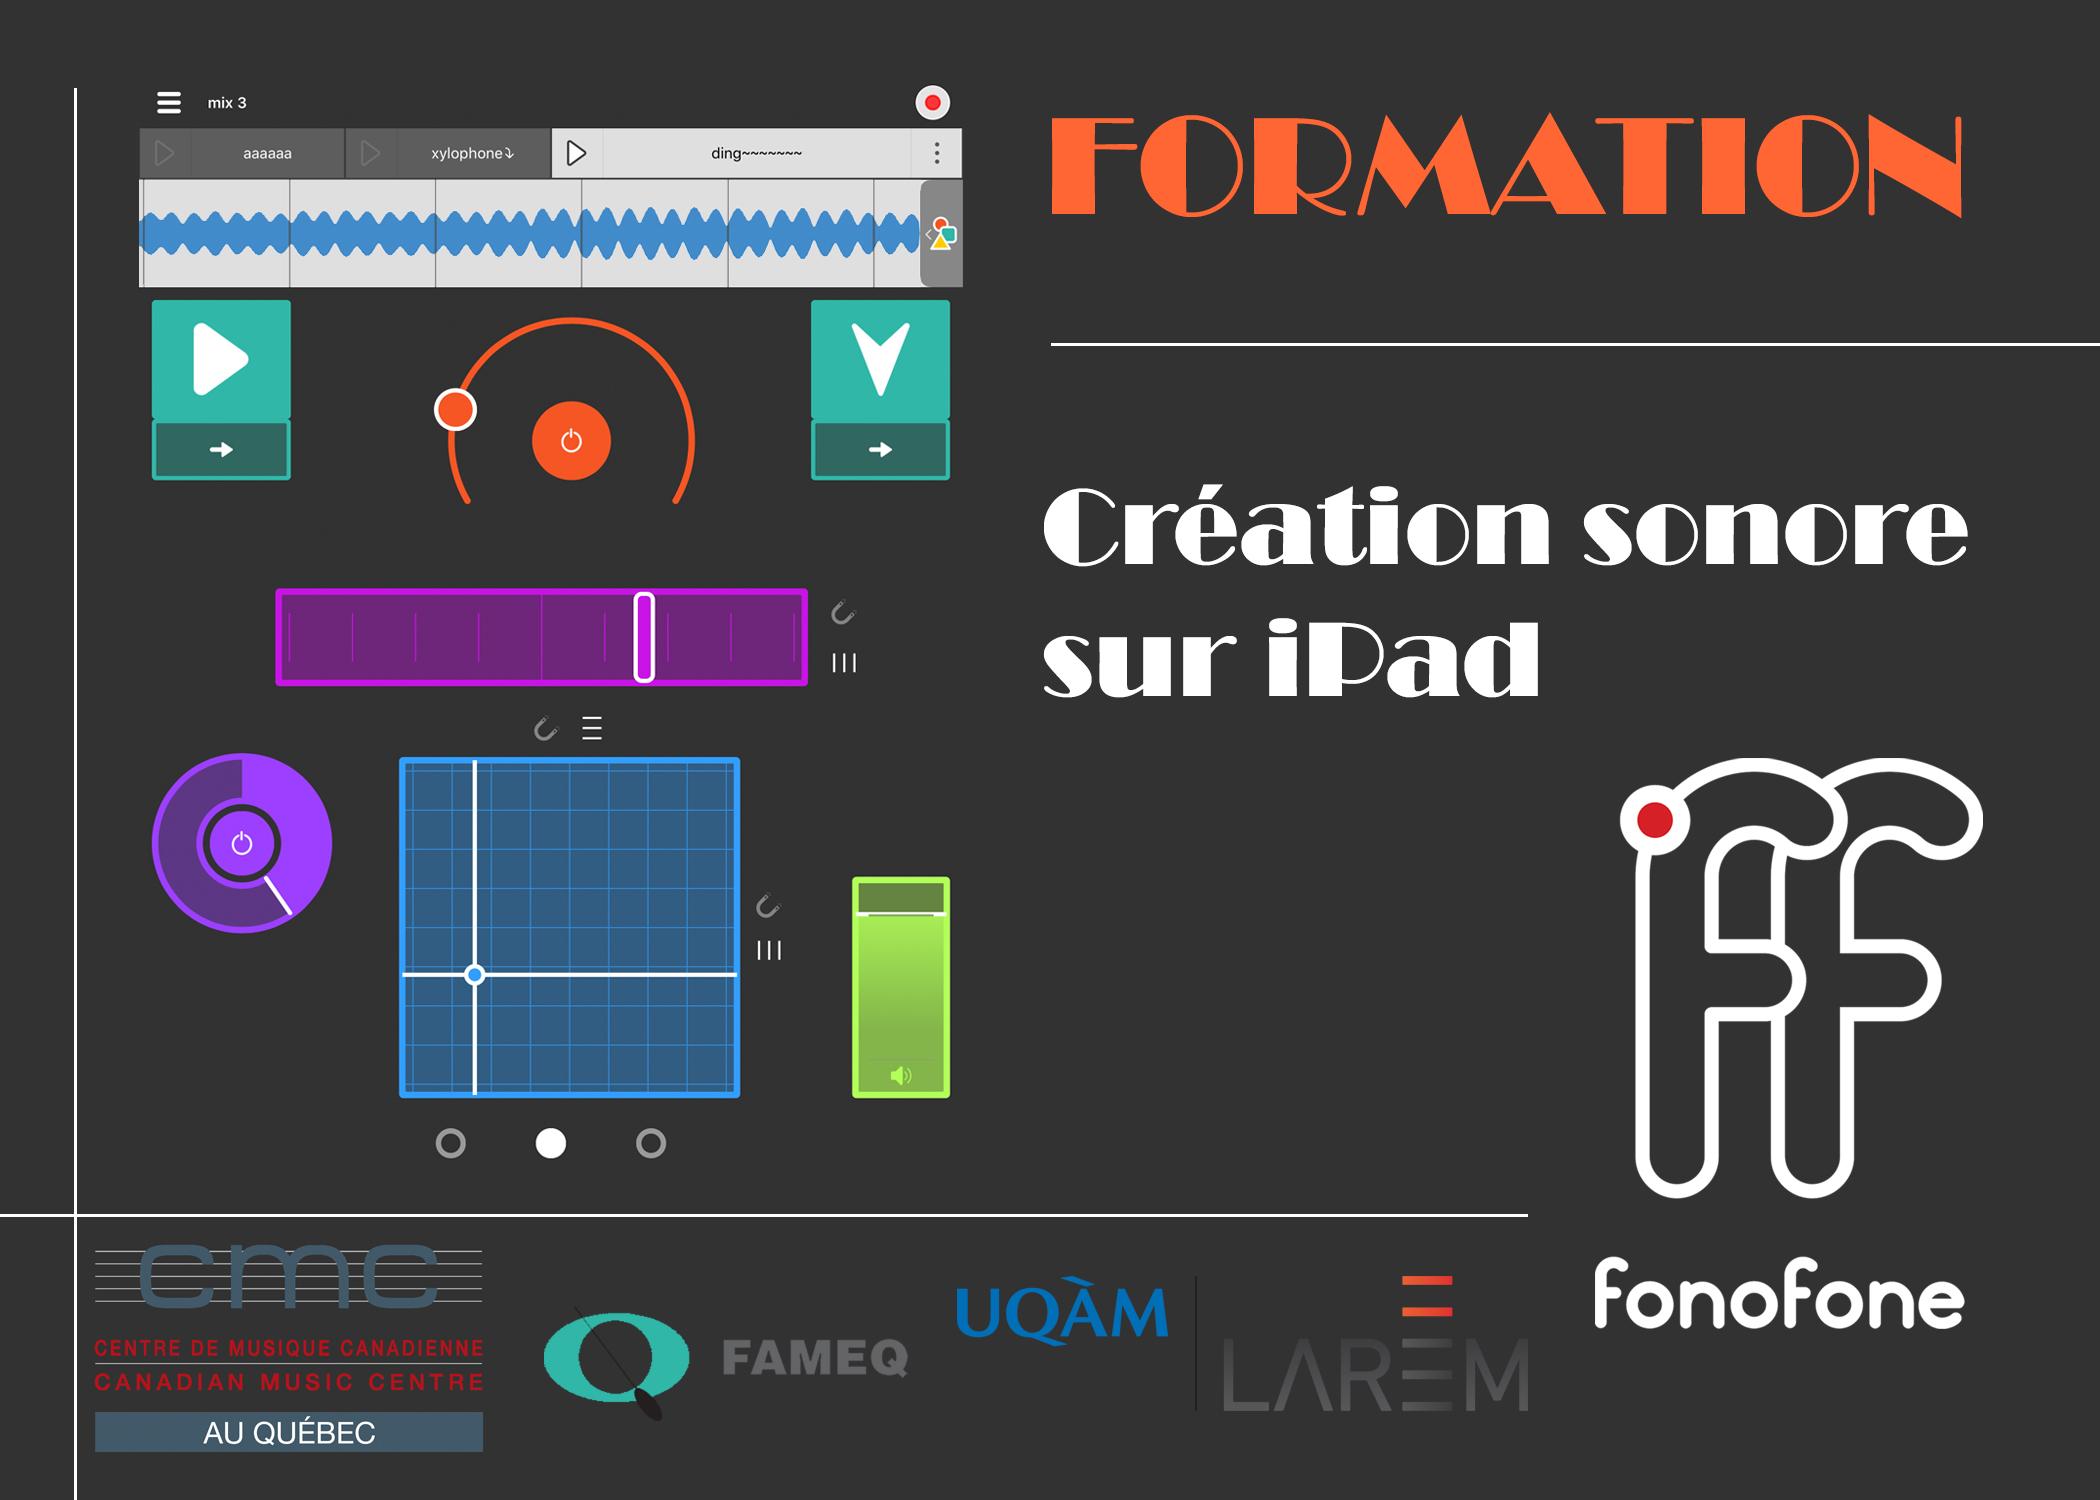 formation-uqam-fameq-cmc